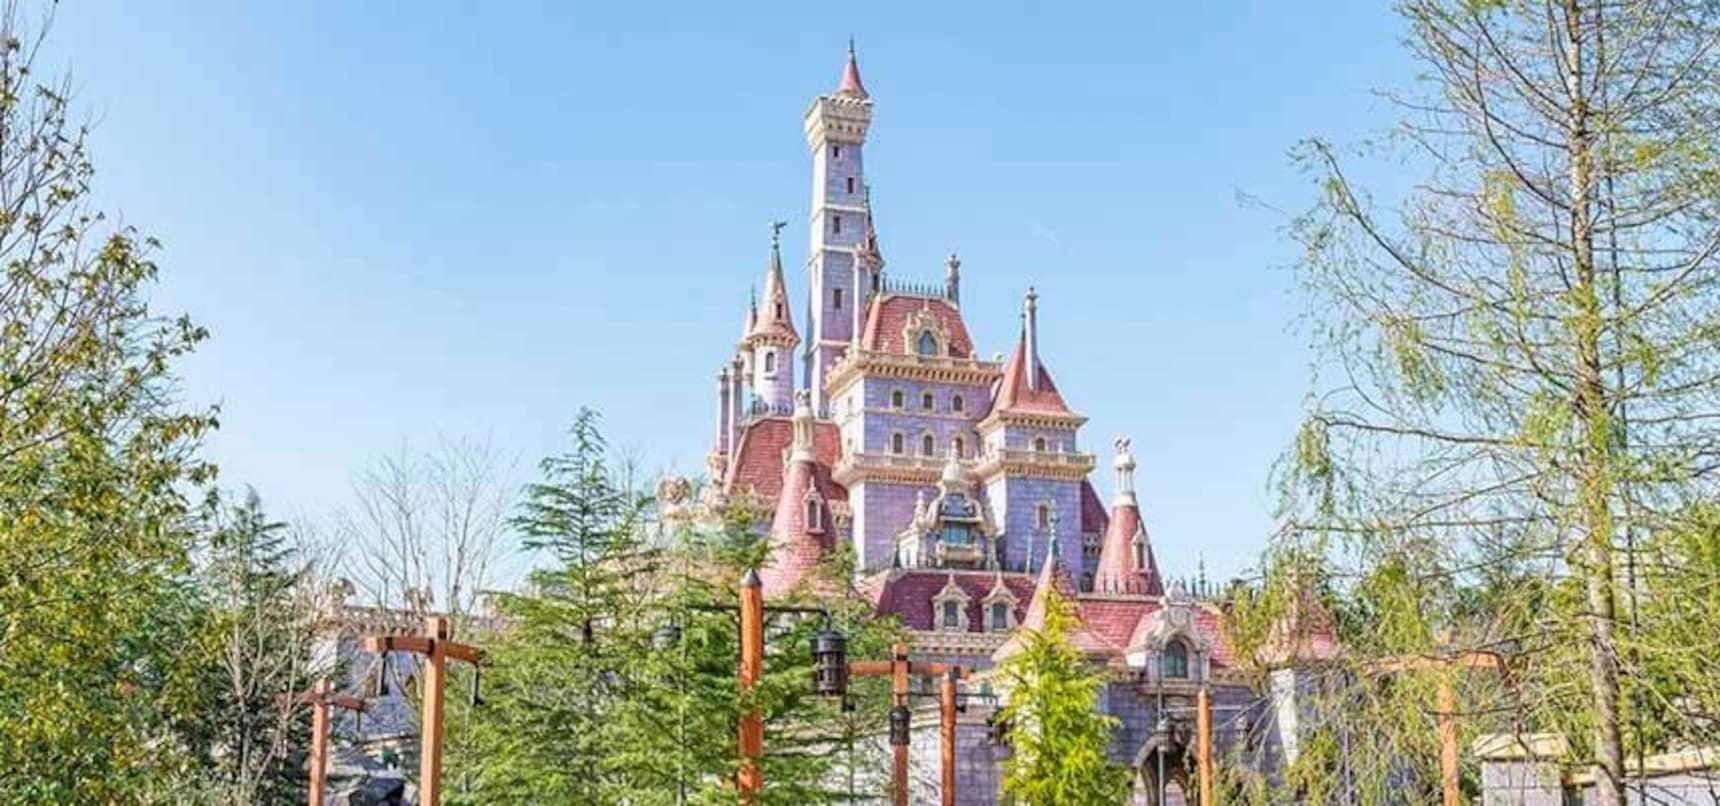 Beauty and the Beast at Tokyo Disneyland